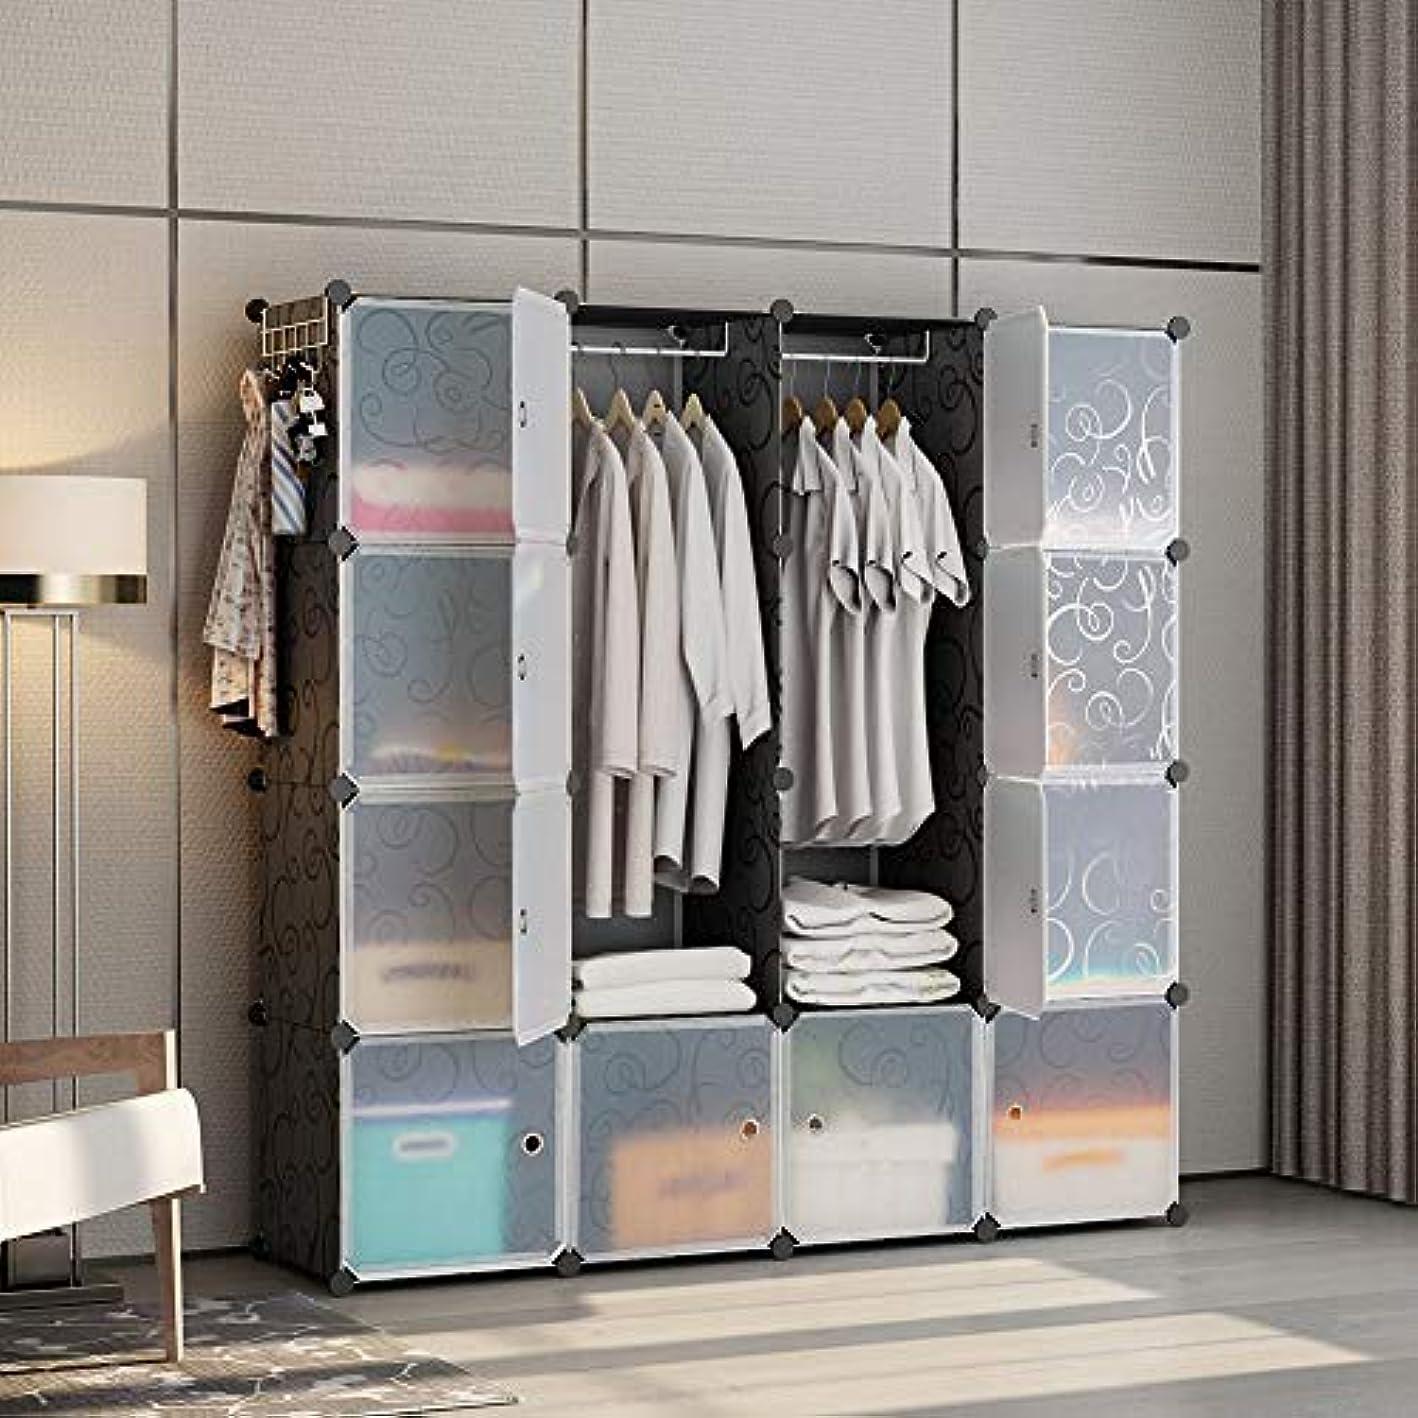 YOZO Modular Closet Portable Wardrobe Garment Rack Ployresin Clothes Storage Organizer Cube Shelving Unit Multifunction Toy Cabinet Bookshelf DIY Furniture, Black, 16 Cubes